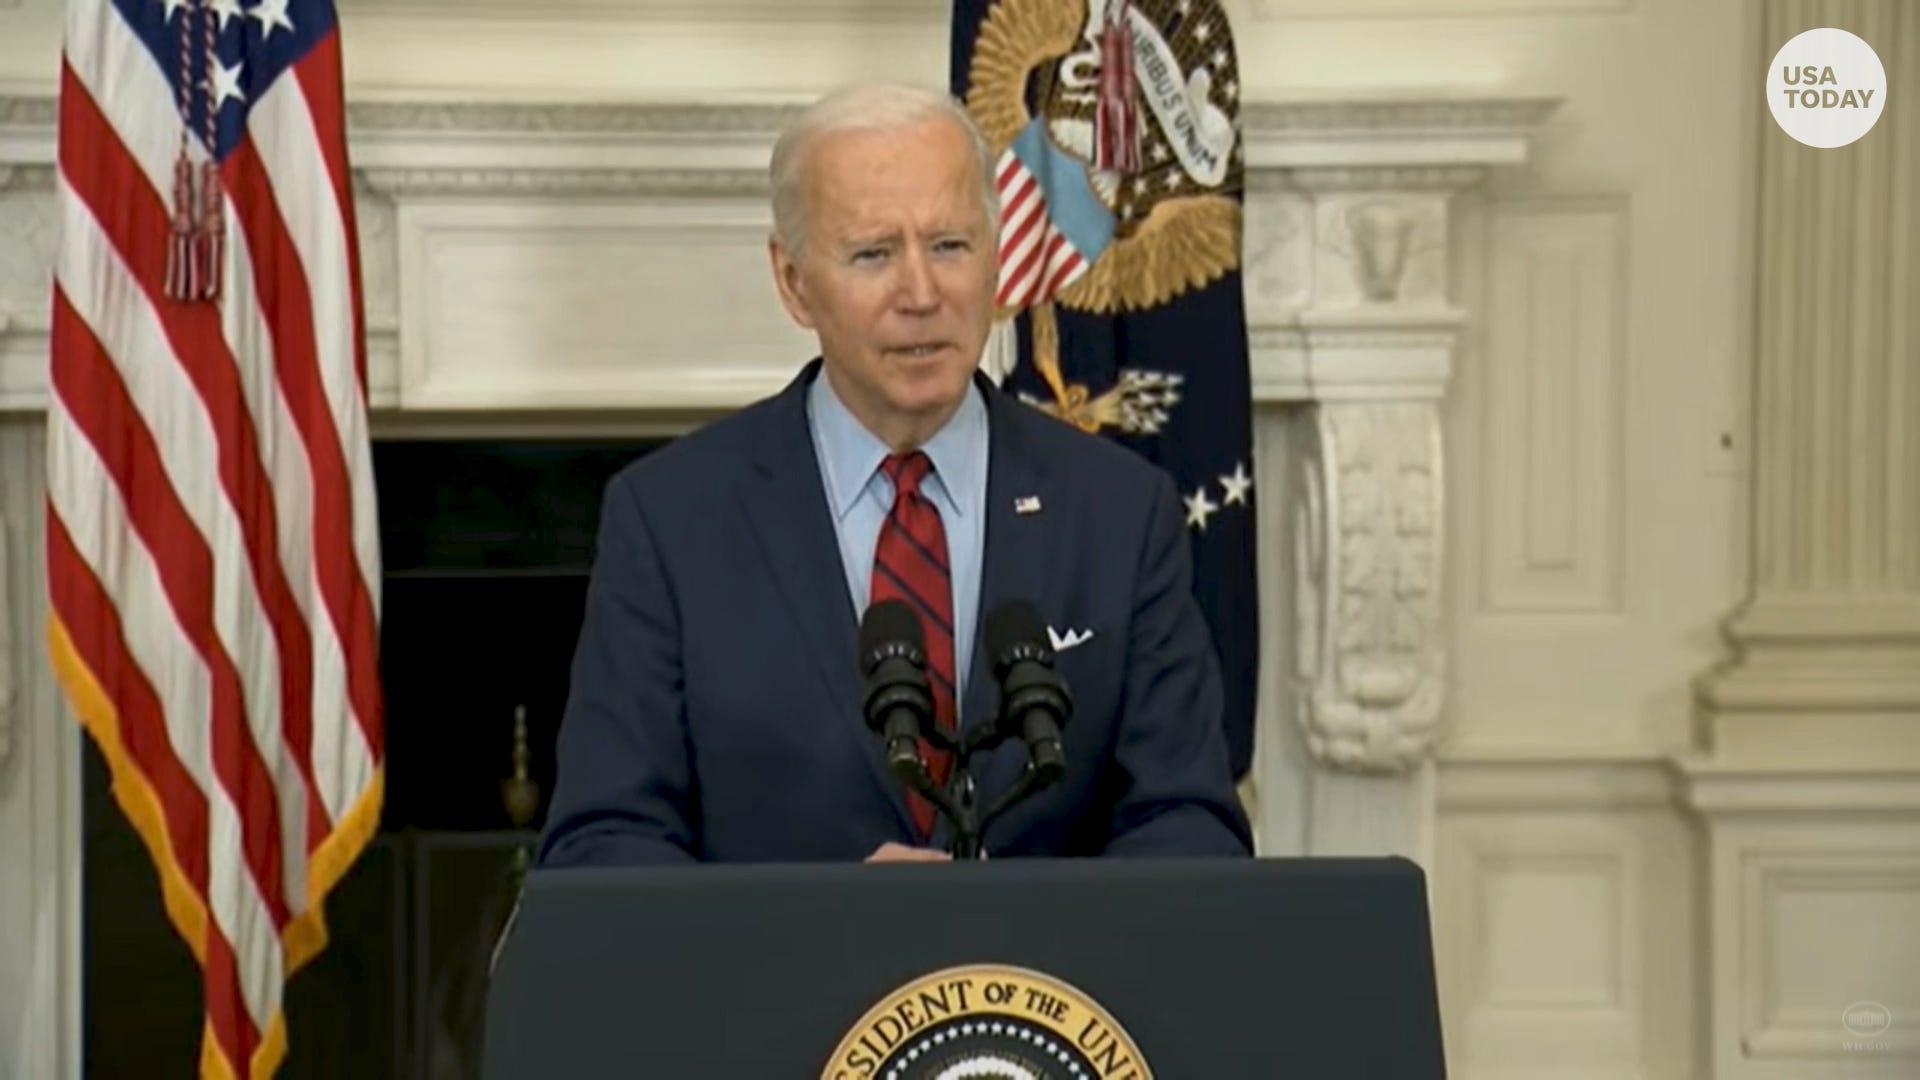 President Biden urges Congress to pass gun safety measures after shooting in Boulder, Colorado